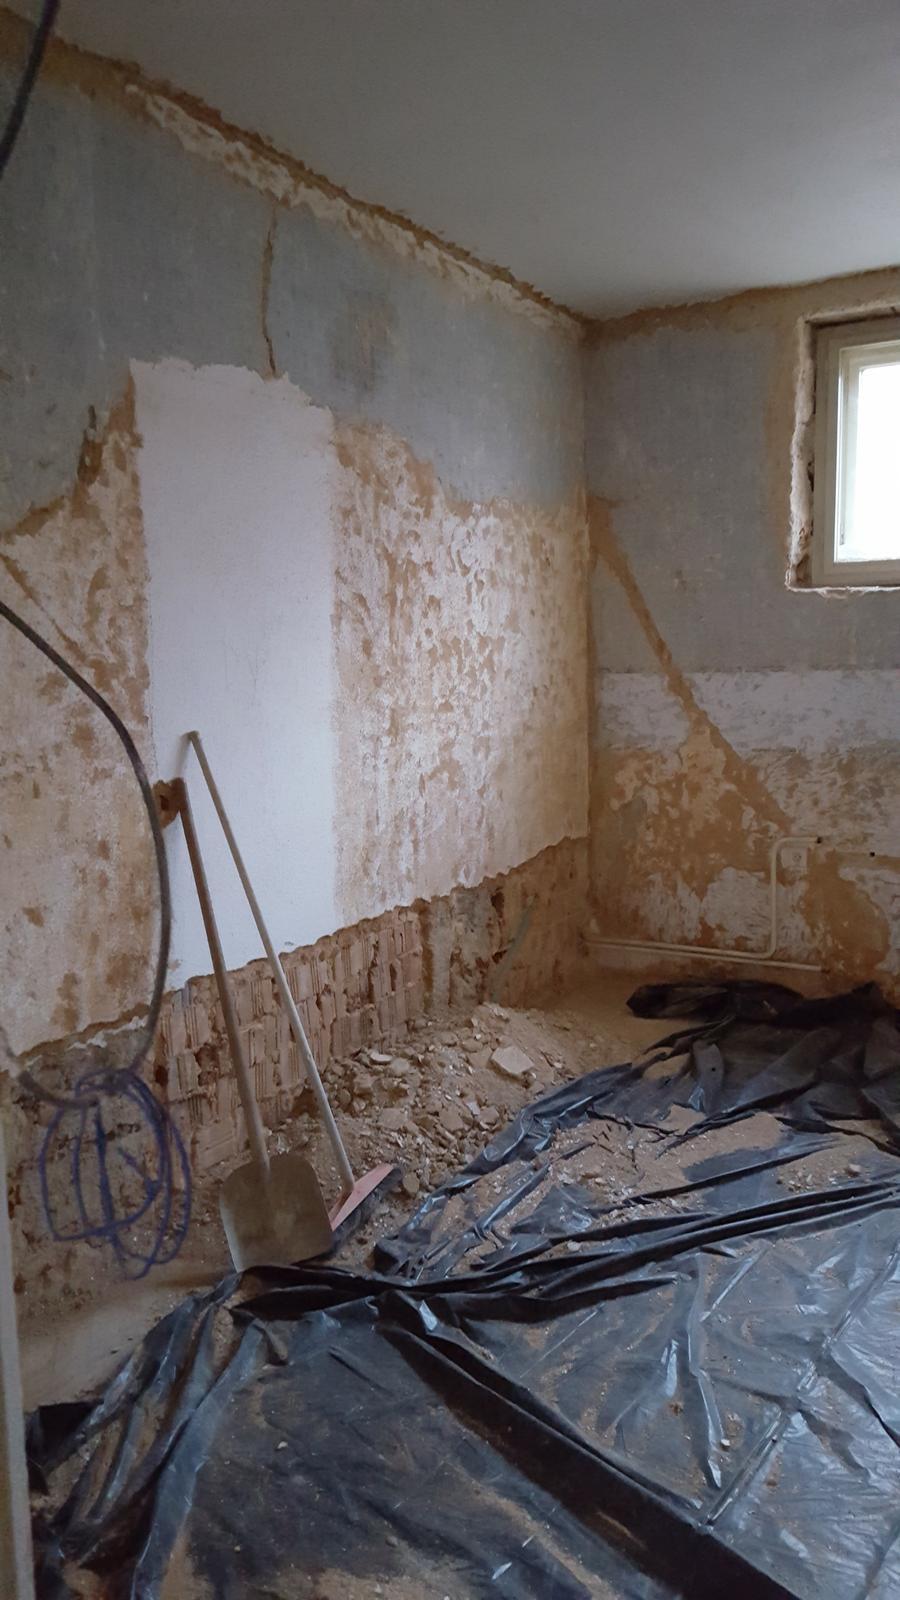 Prerabka domu v historickom centre - spalna sa pomaly skrabe a pripravuje na vyburanie otvoru do kupelne